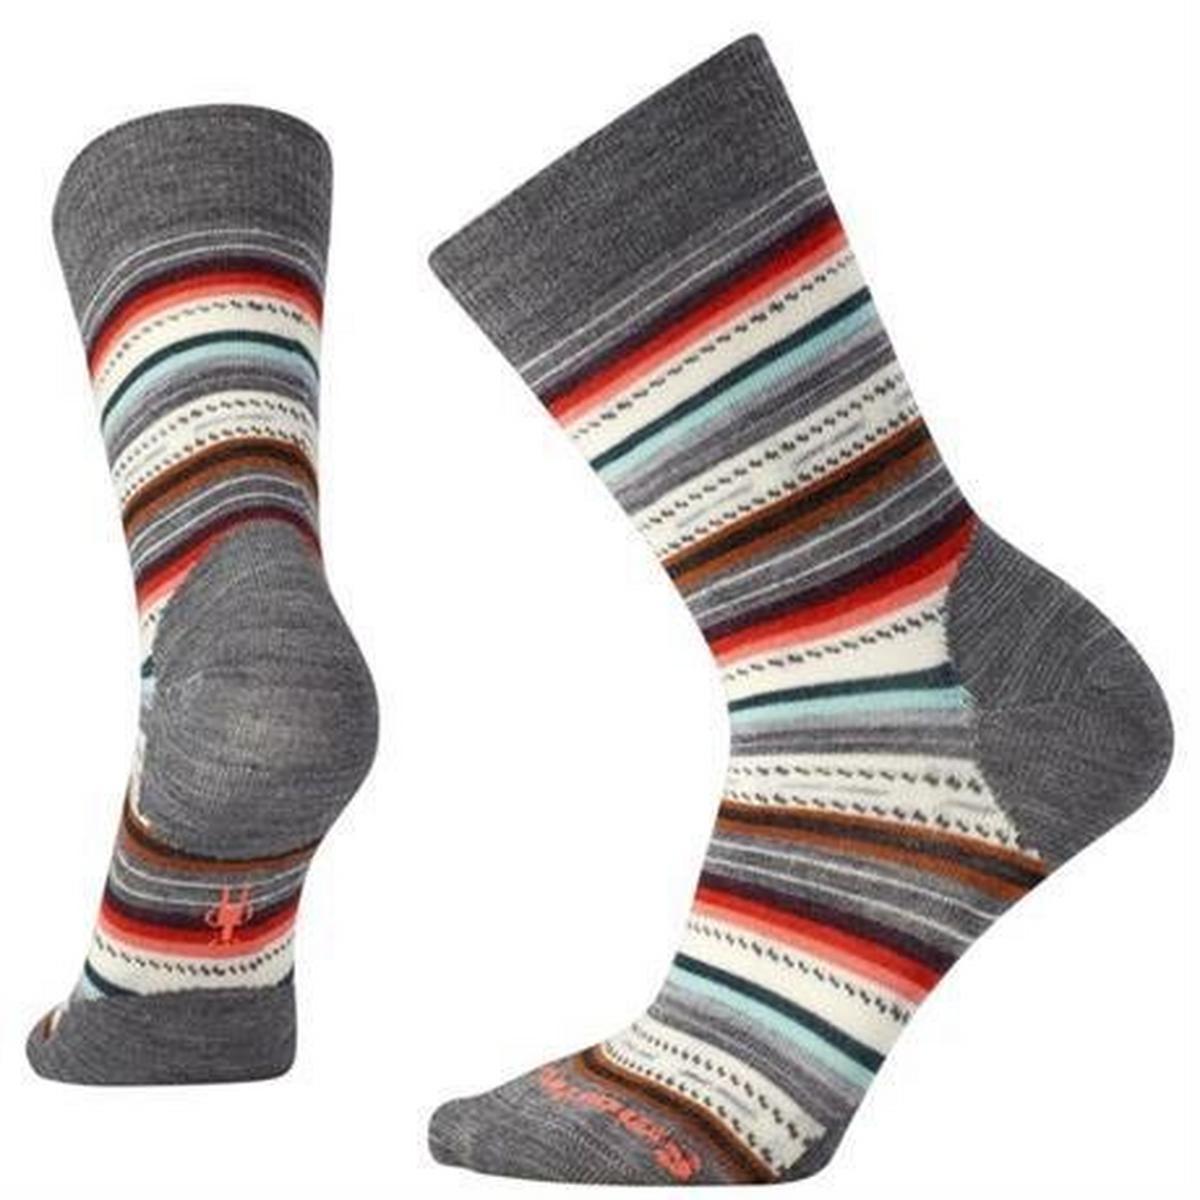 Smartwool Socks Women's Margarita Medium Grey Heather/Coral